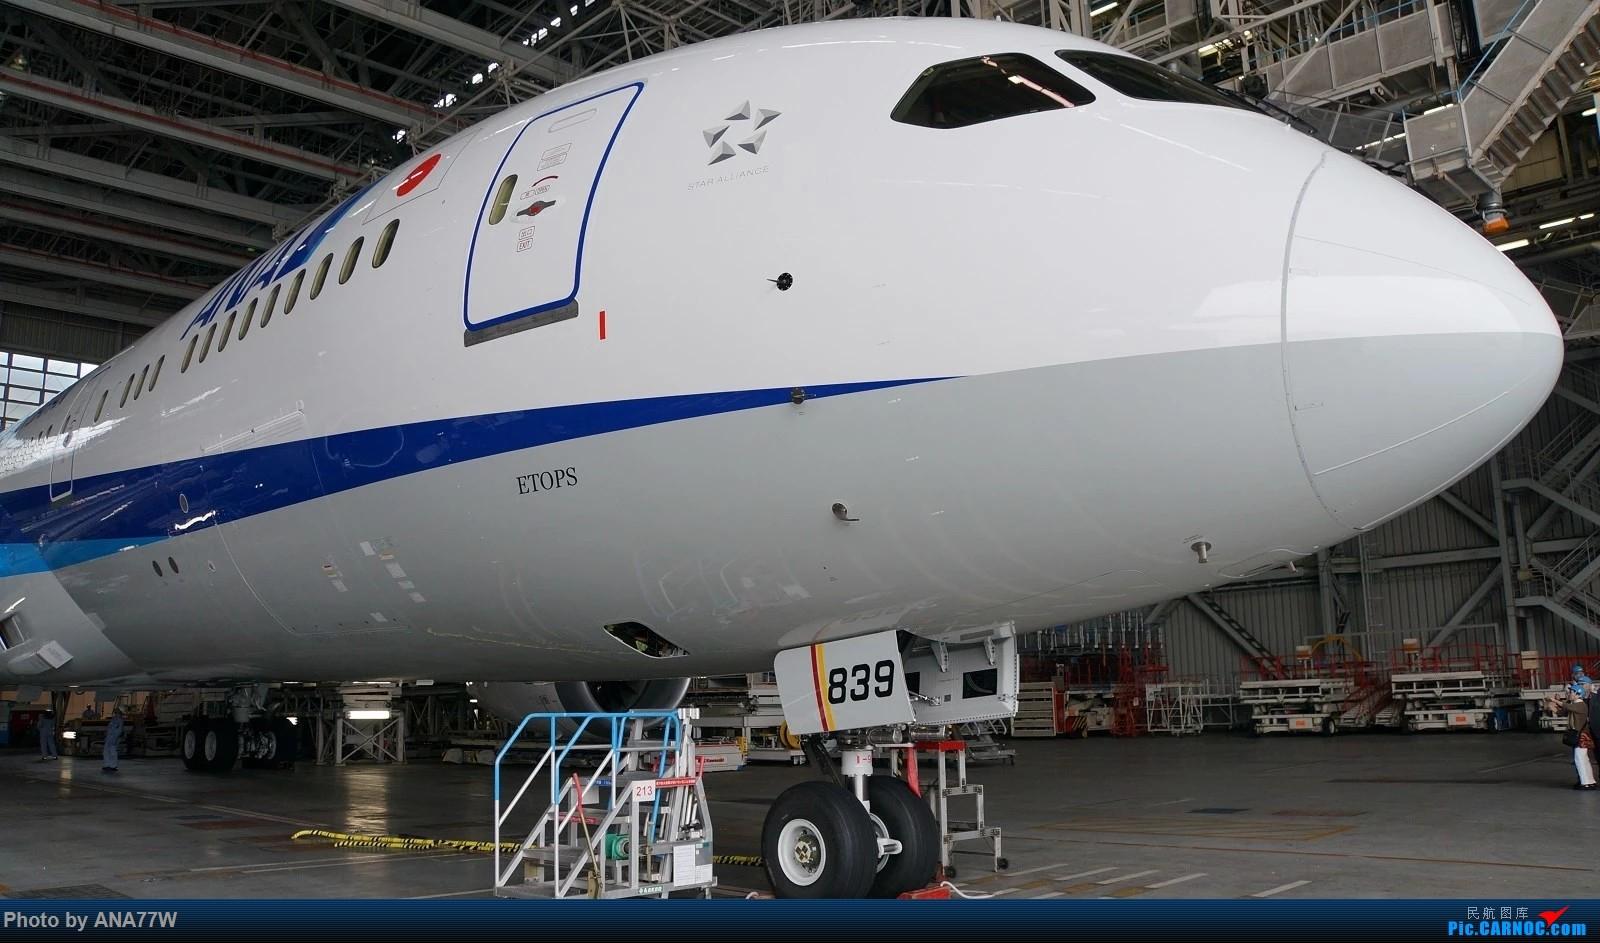 Re:参观全日空机库,GE90的威力,超新的789,……恶劣的天气……昏暗的机库…… BOEING 787-9 JA836A 日本东京羽田国际机场